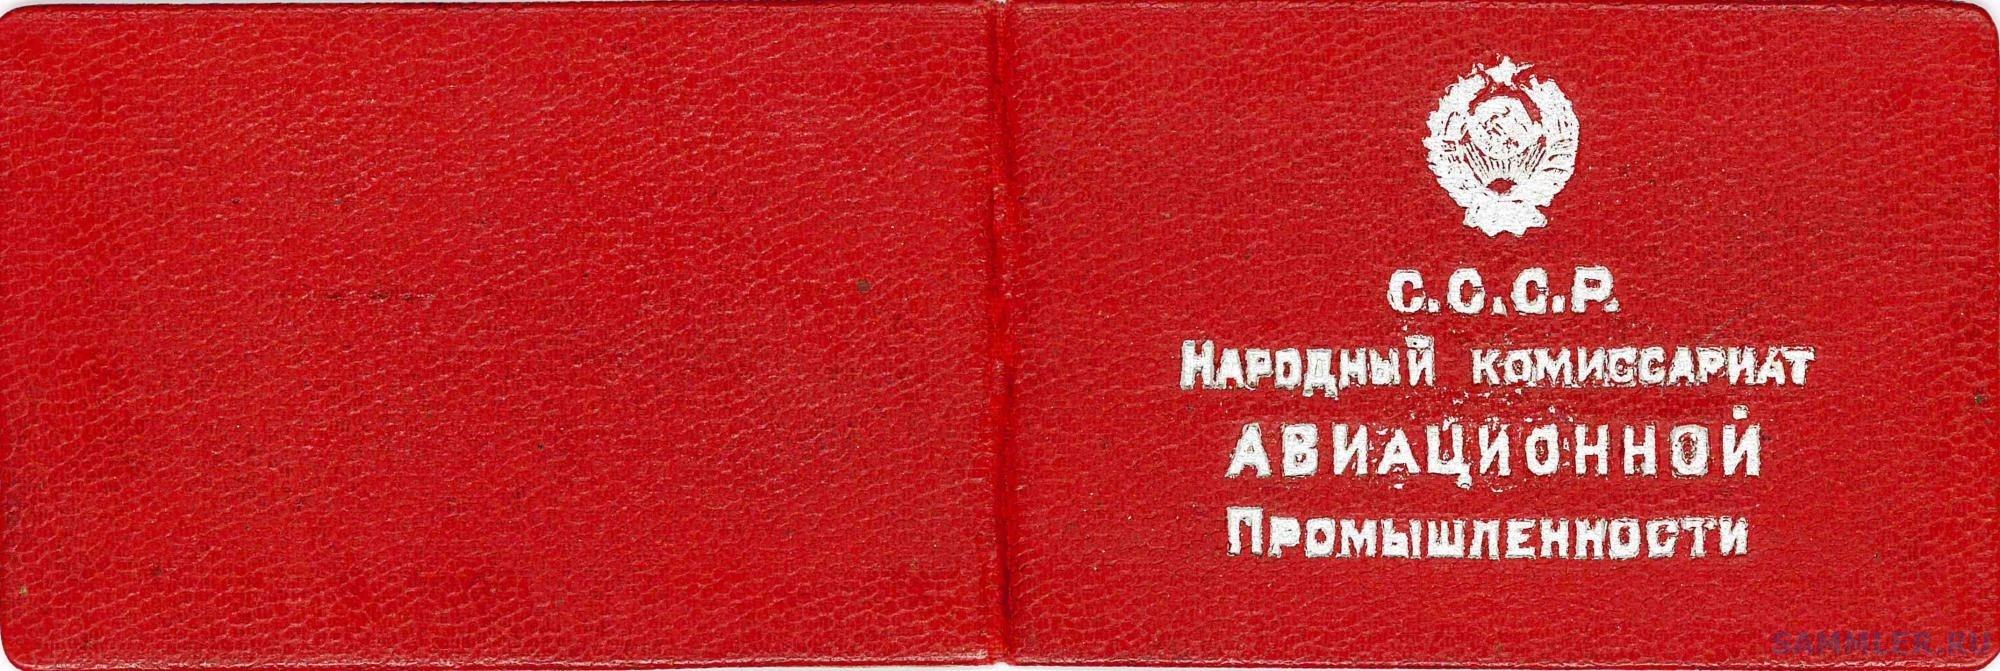 Удостоверение НКАП СССР N962 Степануха Прокофий Петрович-1.jpg